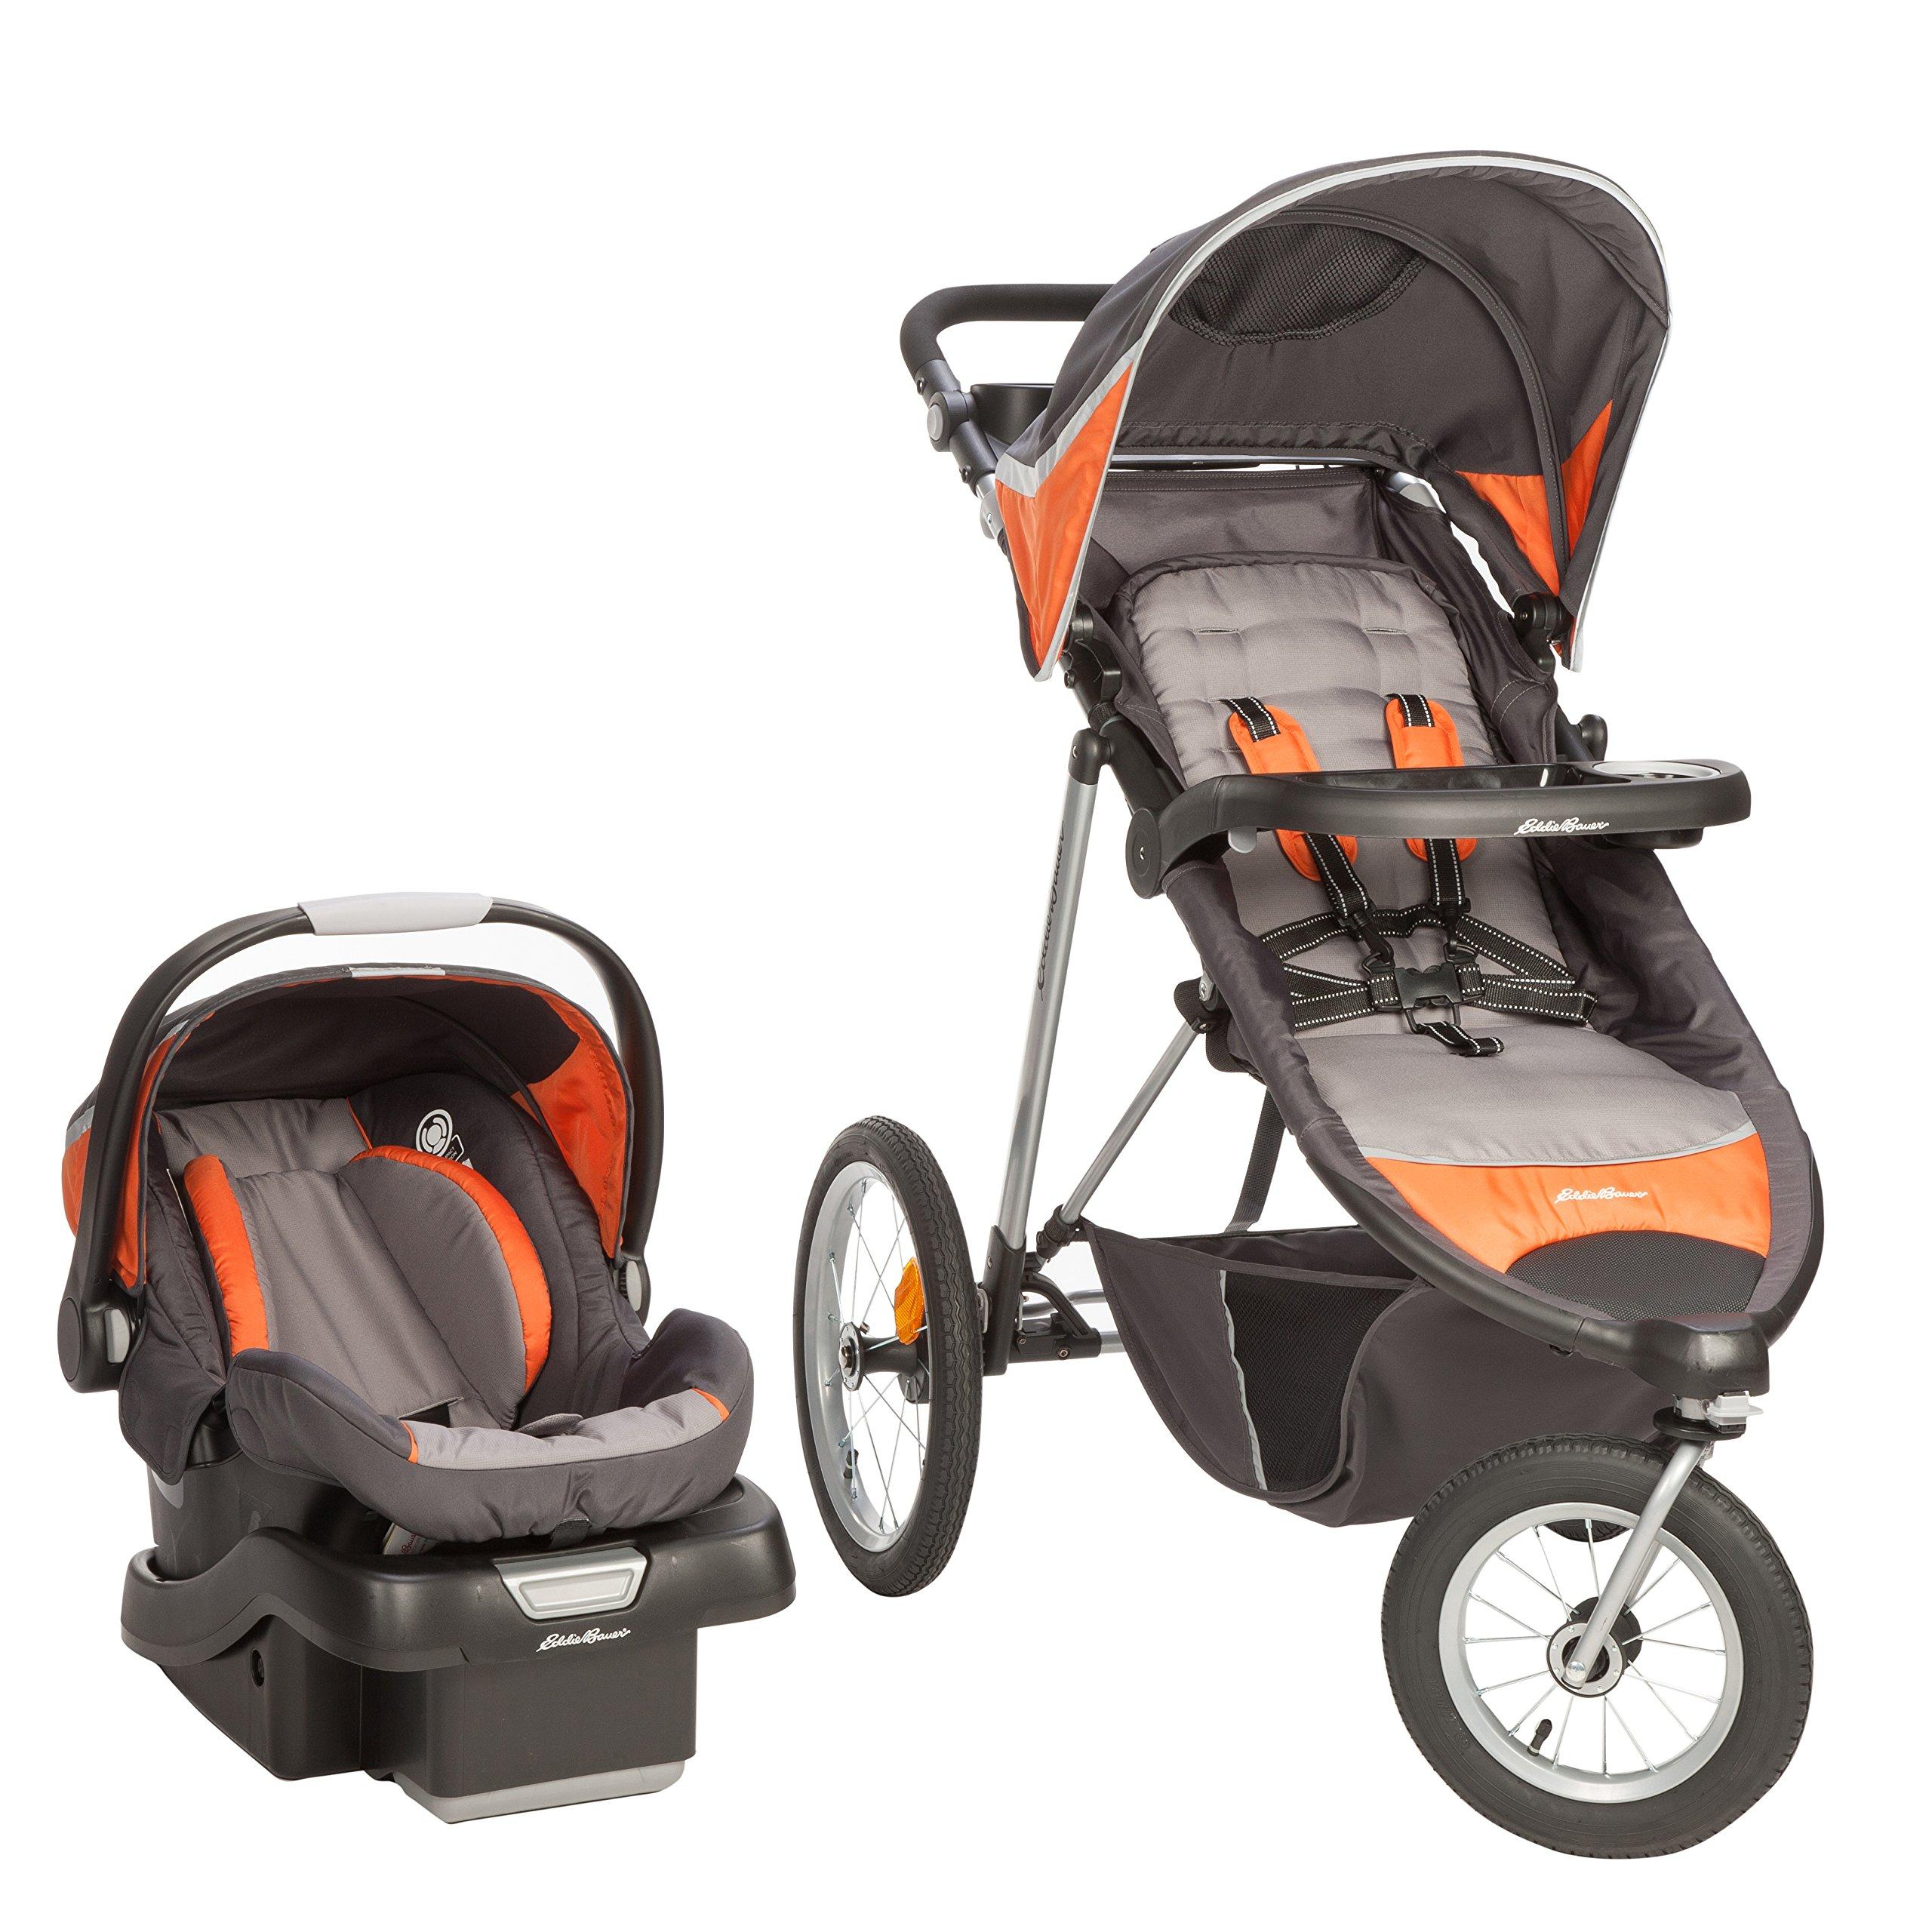 Ed Bauer TrailGuide Jogger Travel System with SureFit Infant Car Seat Blazing Orange